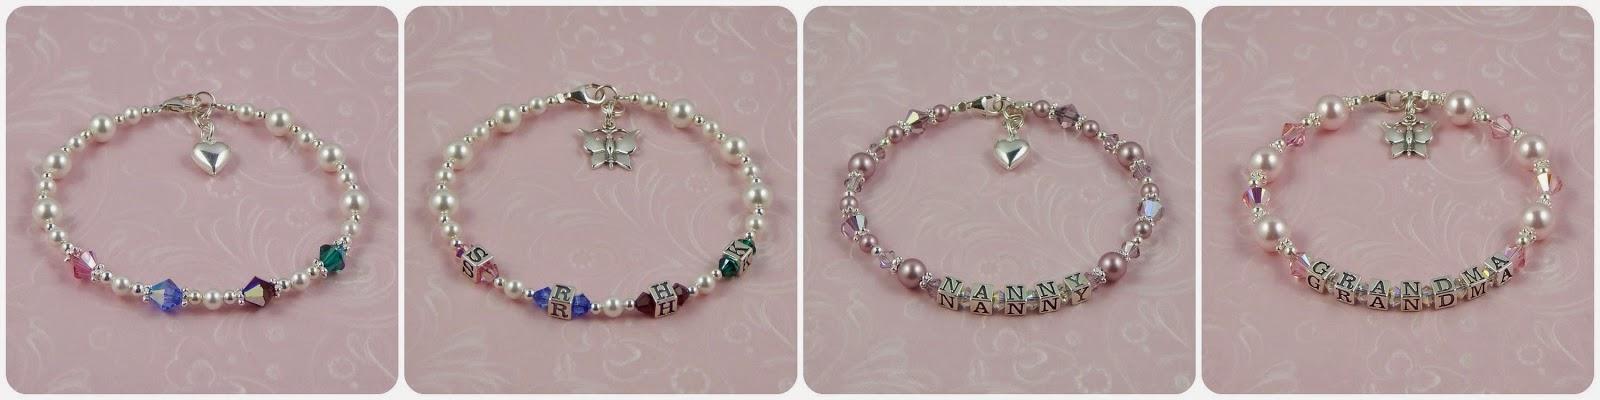 Grandmother jewellery range